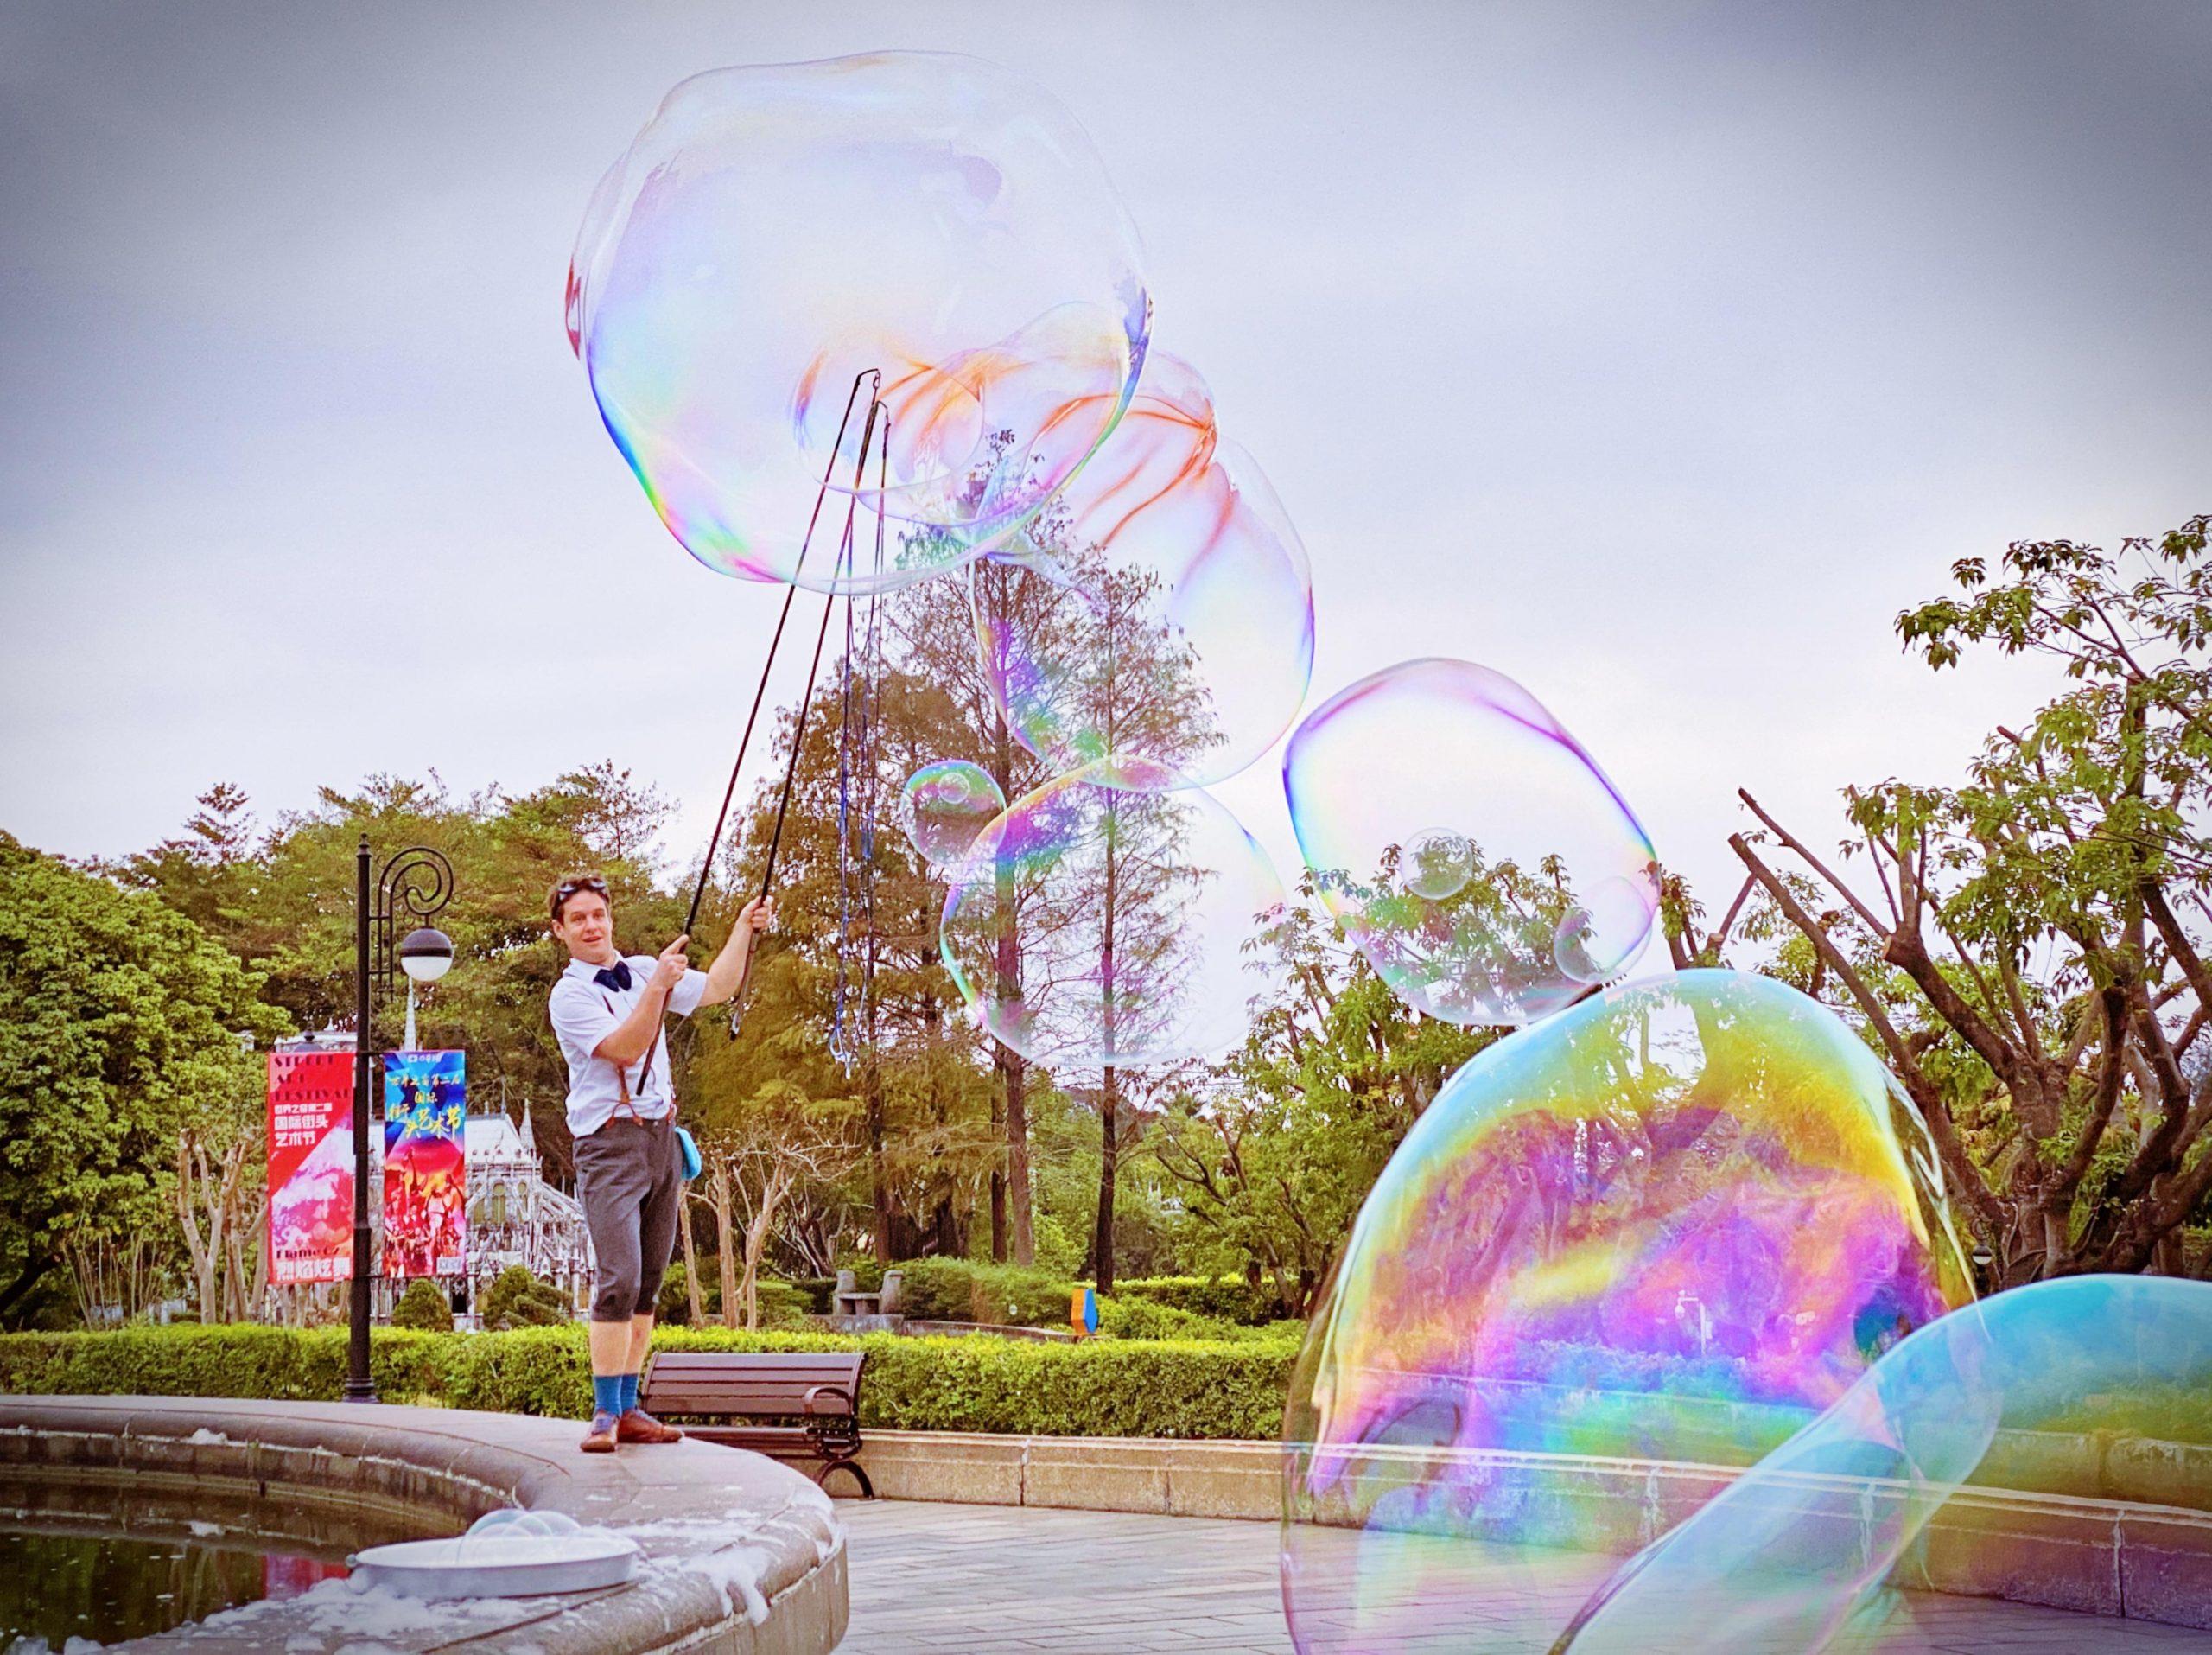 Prof. Bubbles